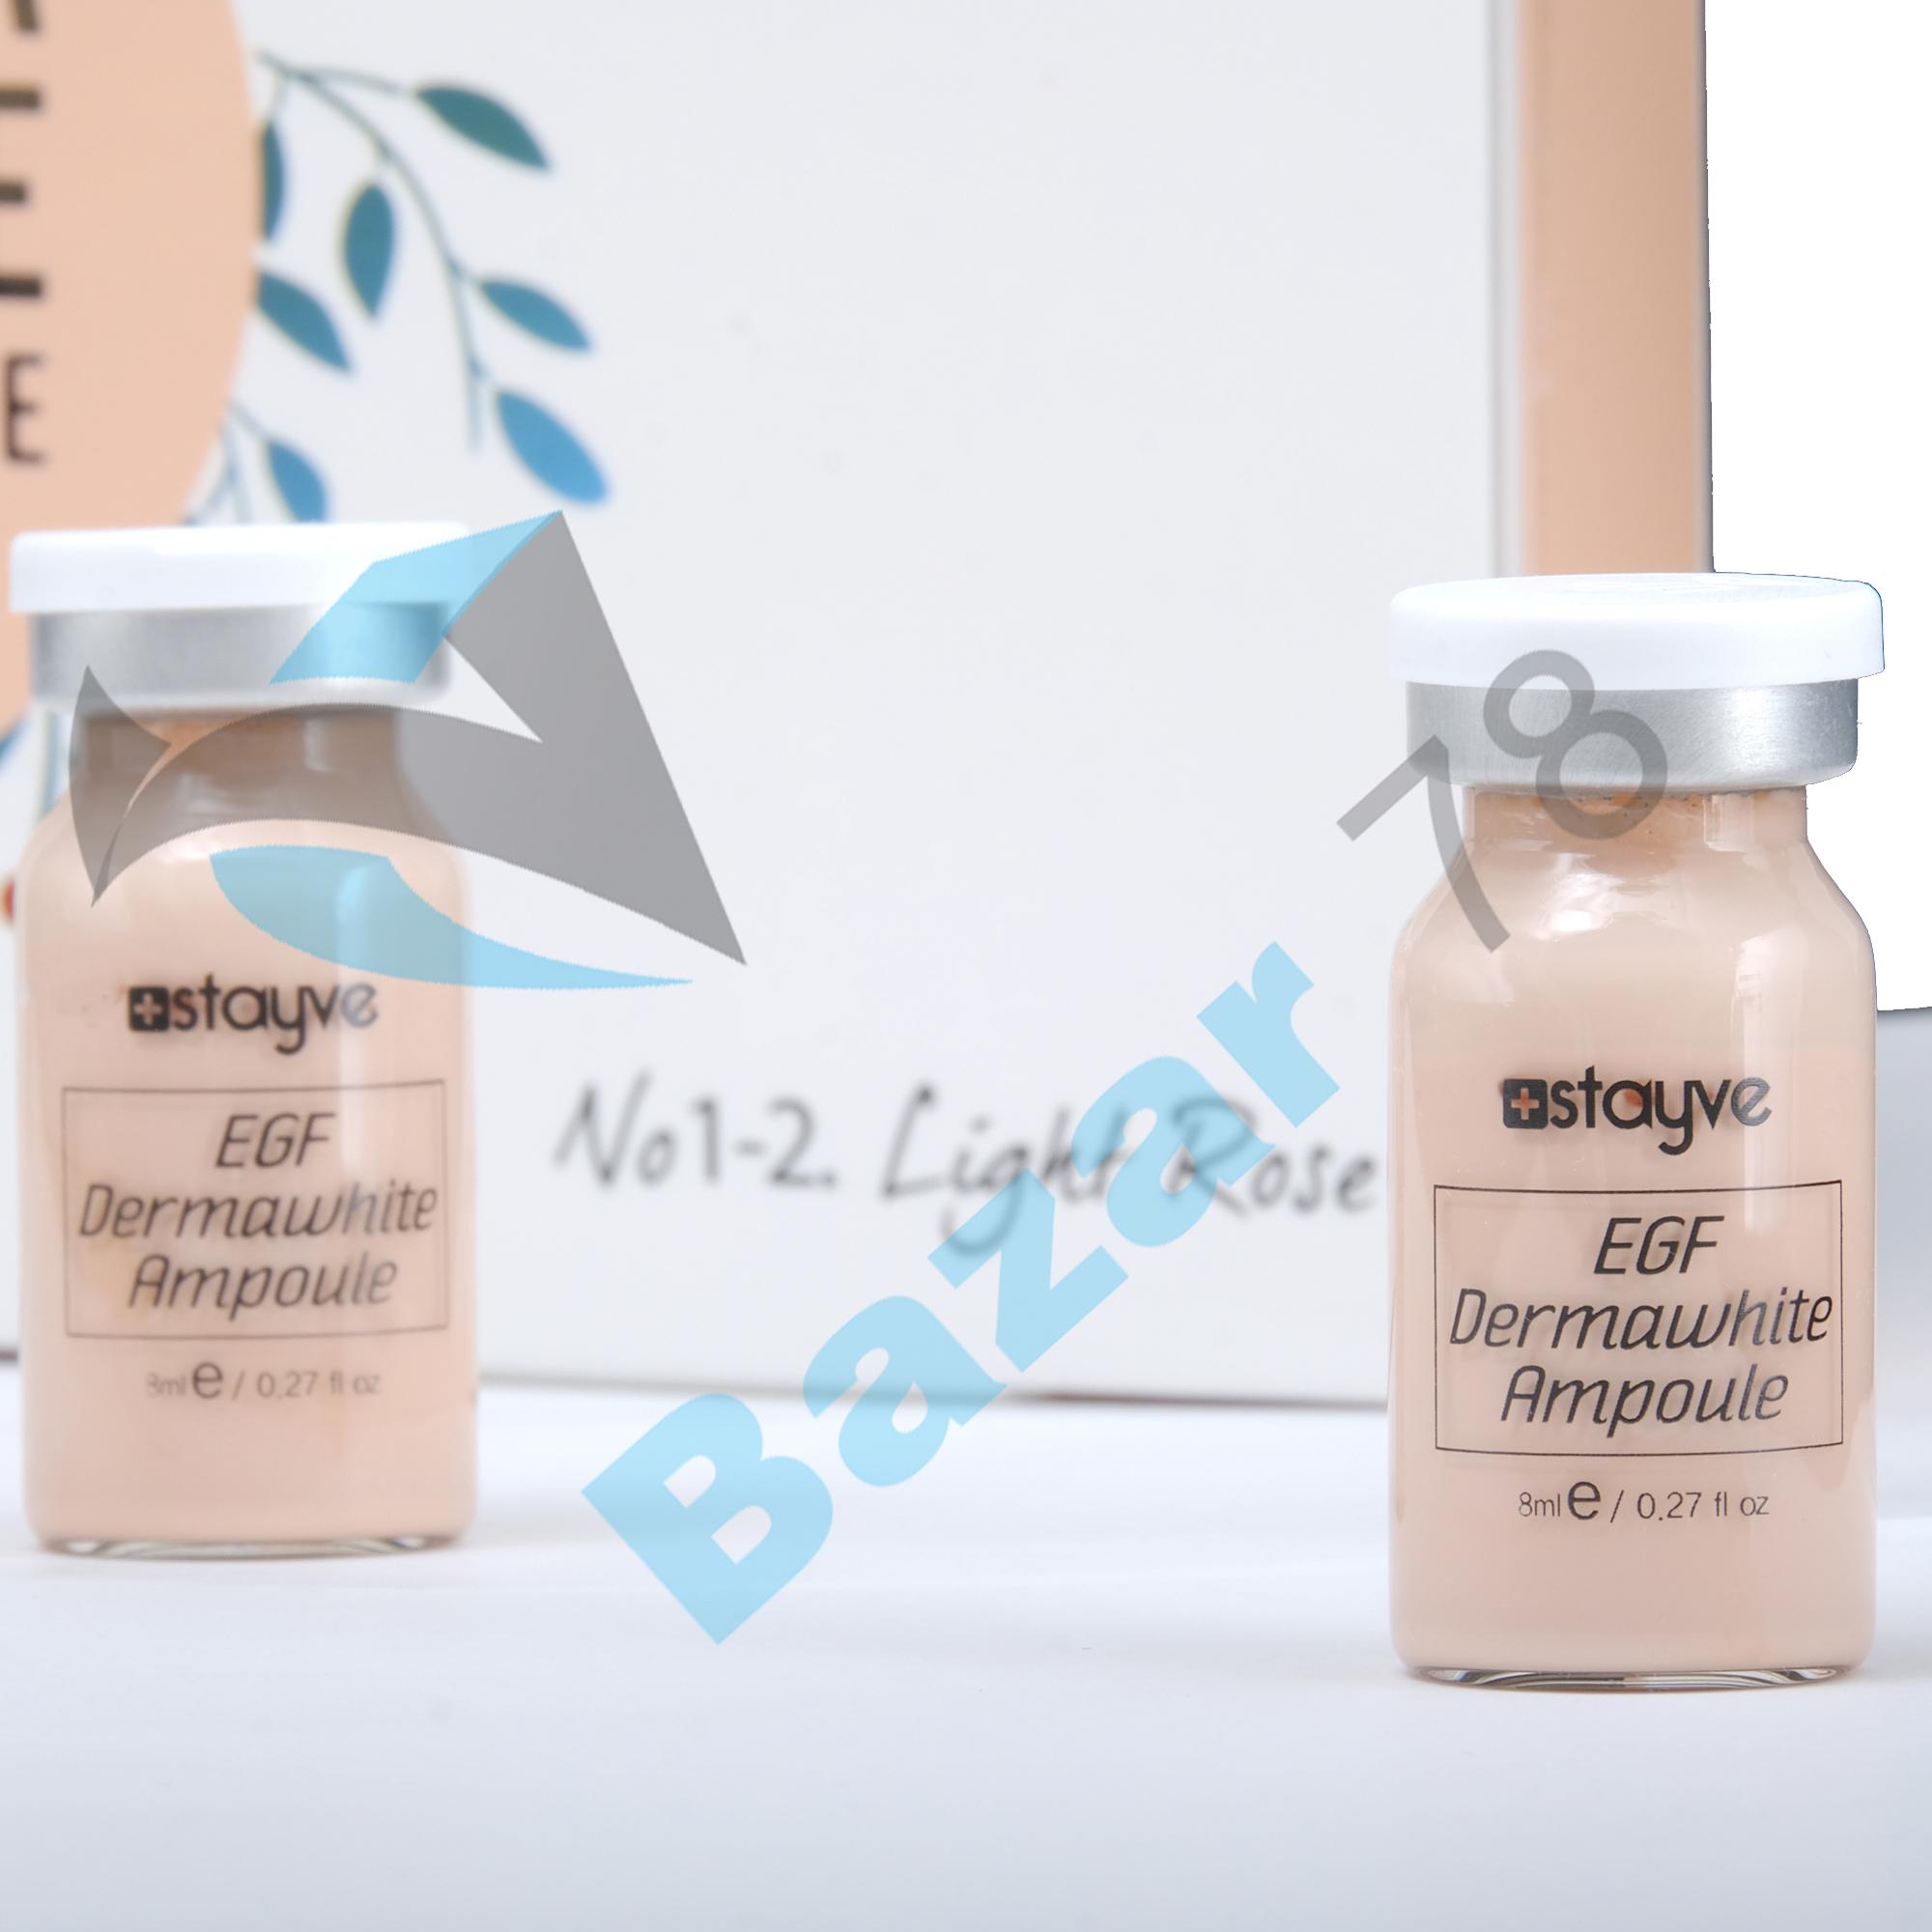 BB сыворотка STAYVE Dermawhite 1-2 Light Rose